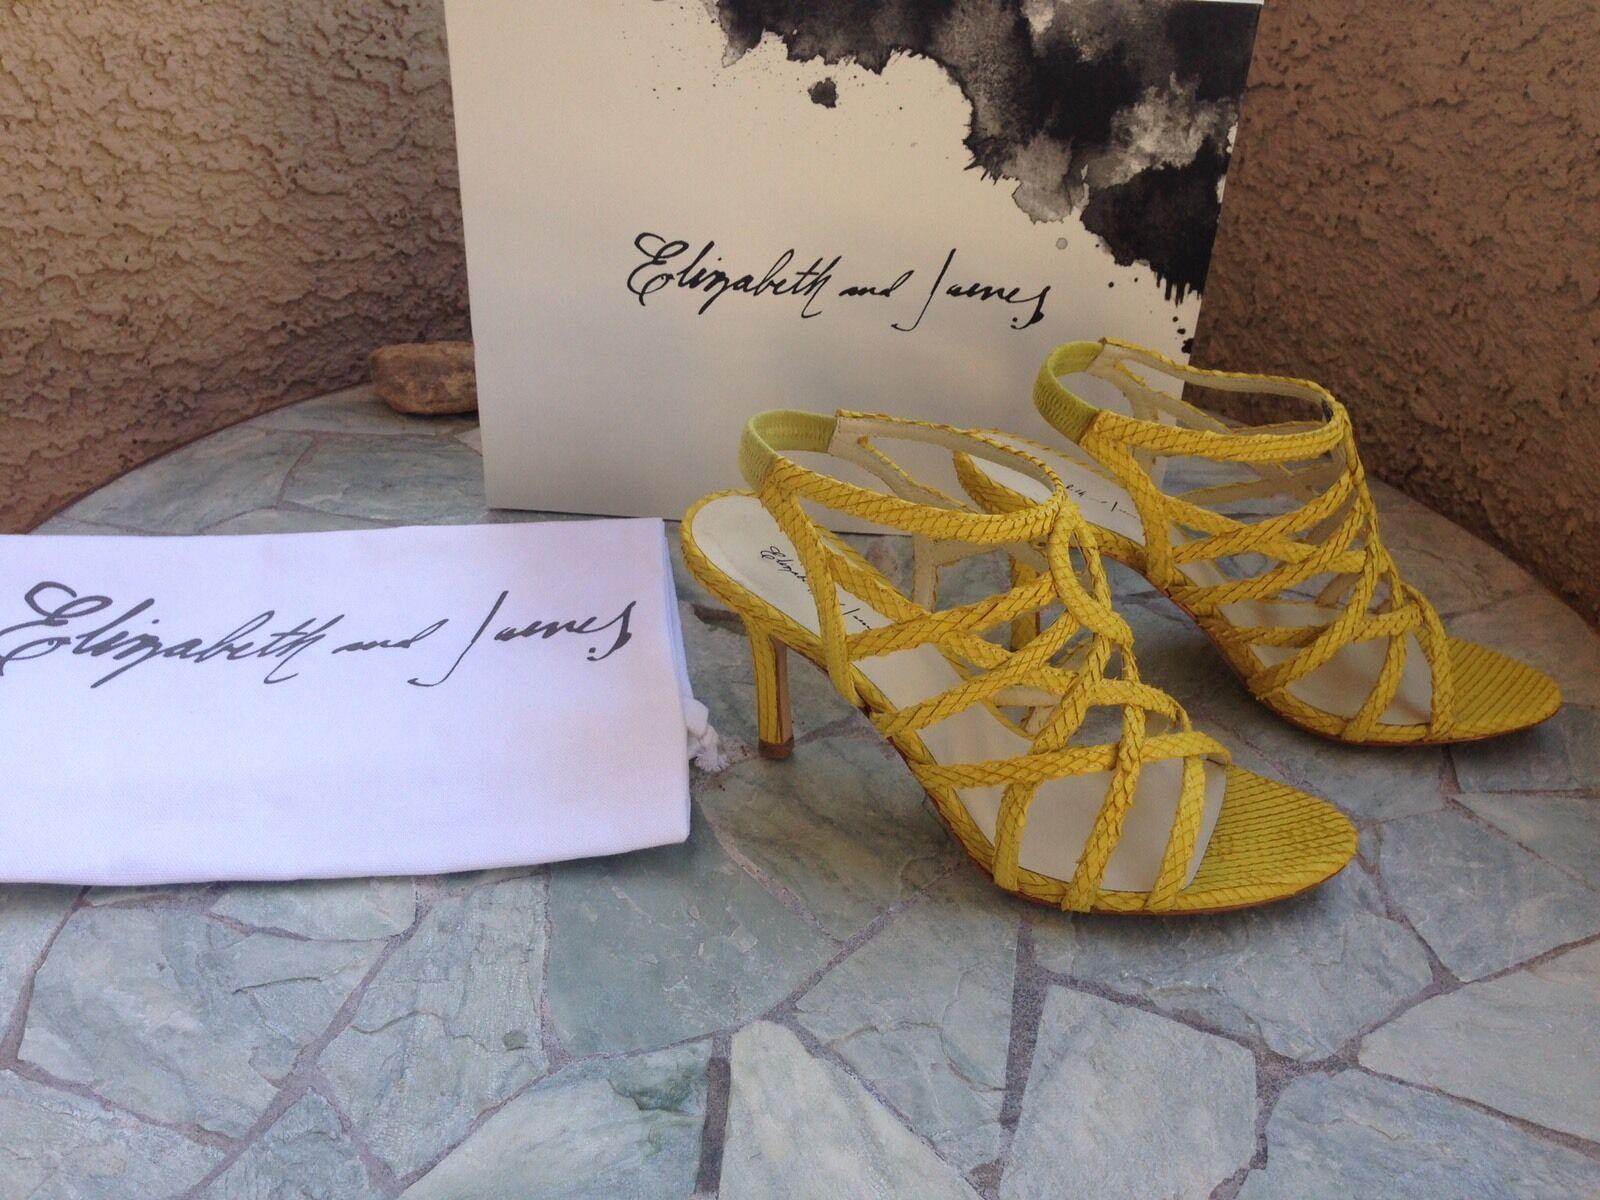 NIB Elizabeth And James Kayla Snakeskin Leder Strappy Yellow 9 Sandales Sz 9 Yellow 339 44e0c0